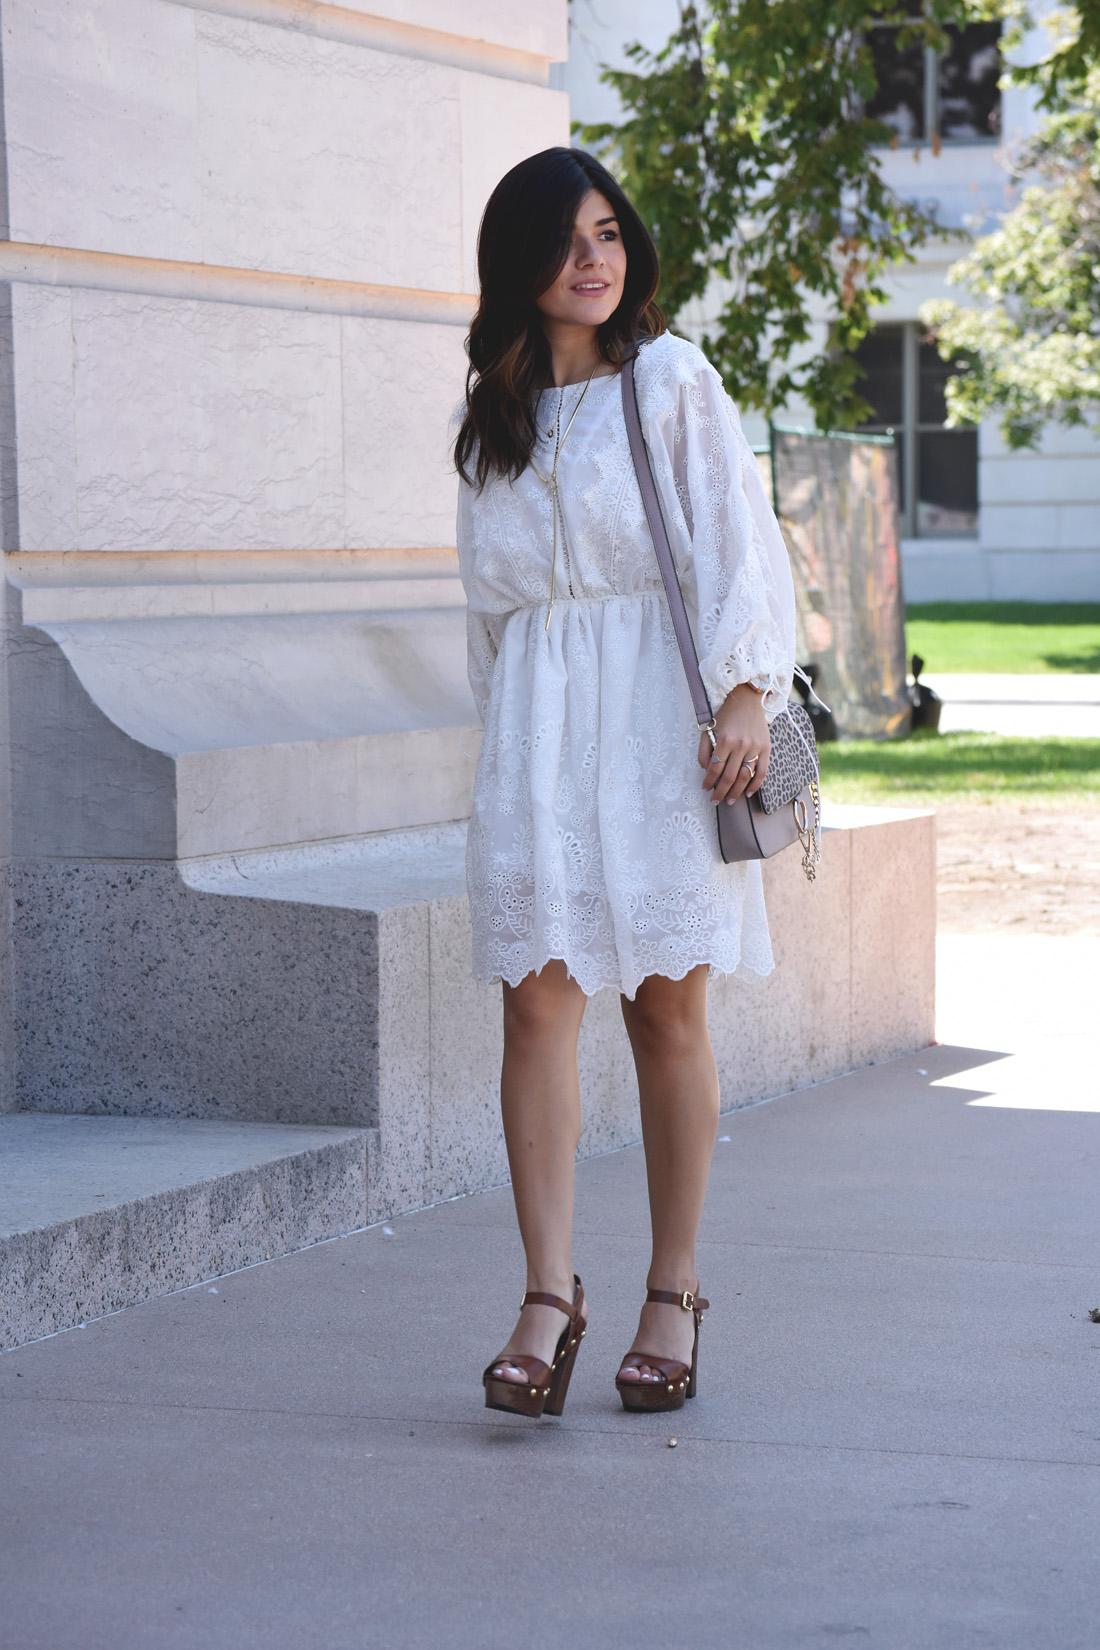 Carolina Hellal of Chic Talk wearing a VIPME white dress, wooden platform sandals, and Kendra scott gold accessories.